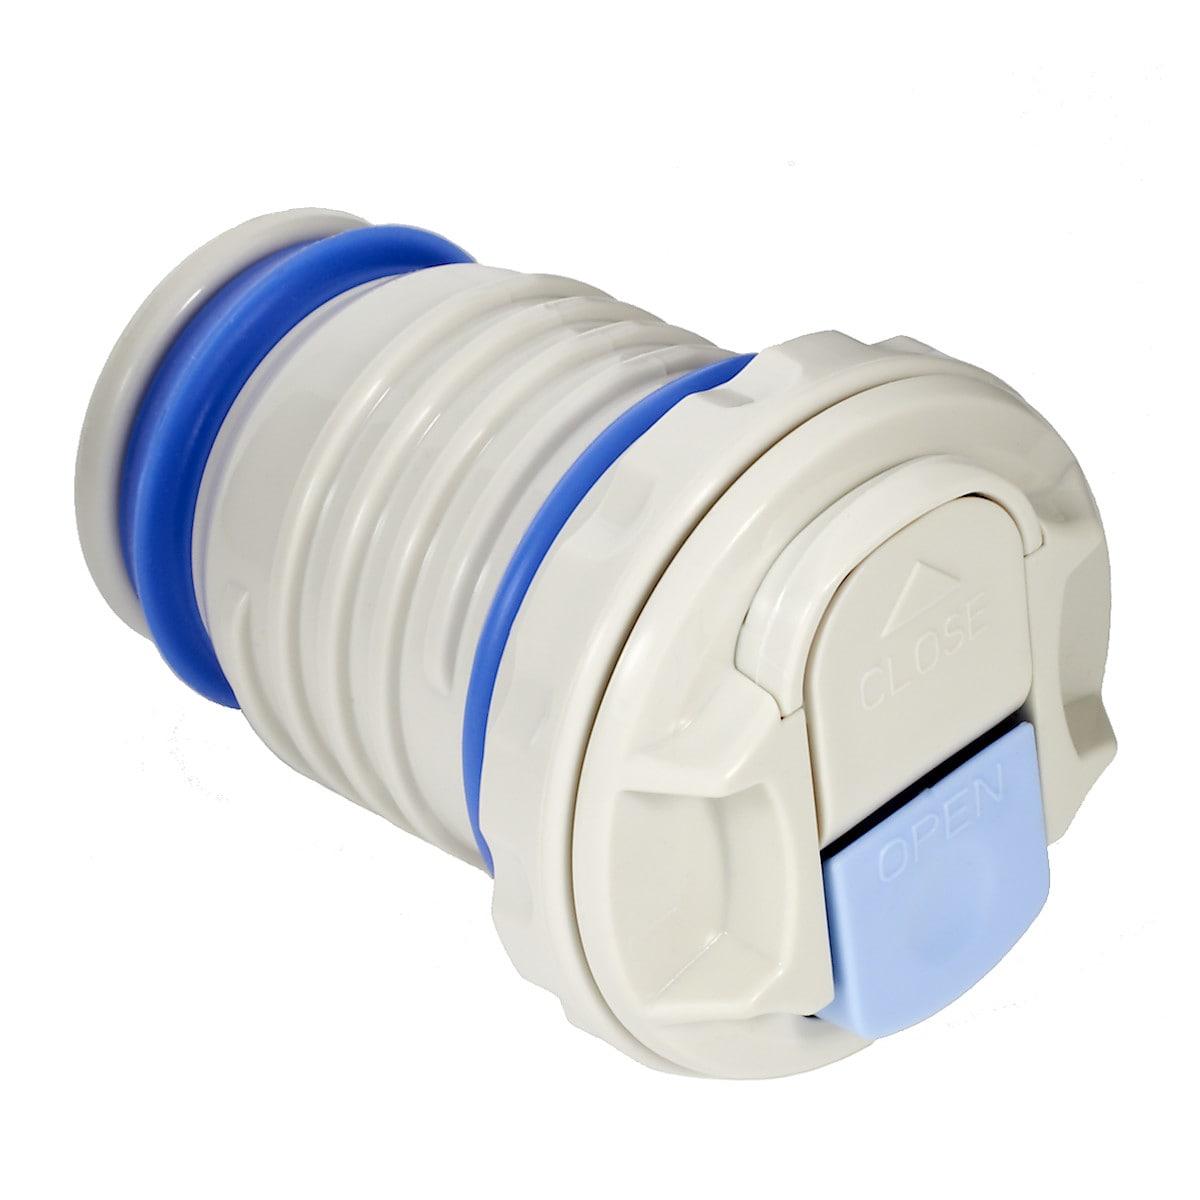 Automatikverschluss Thermos Light & Compact